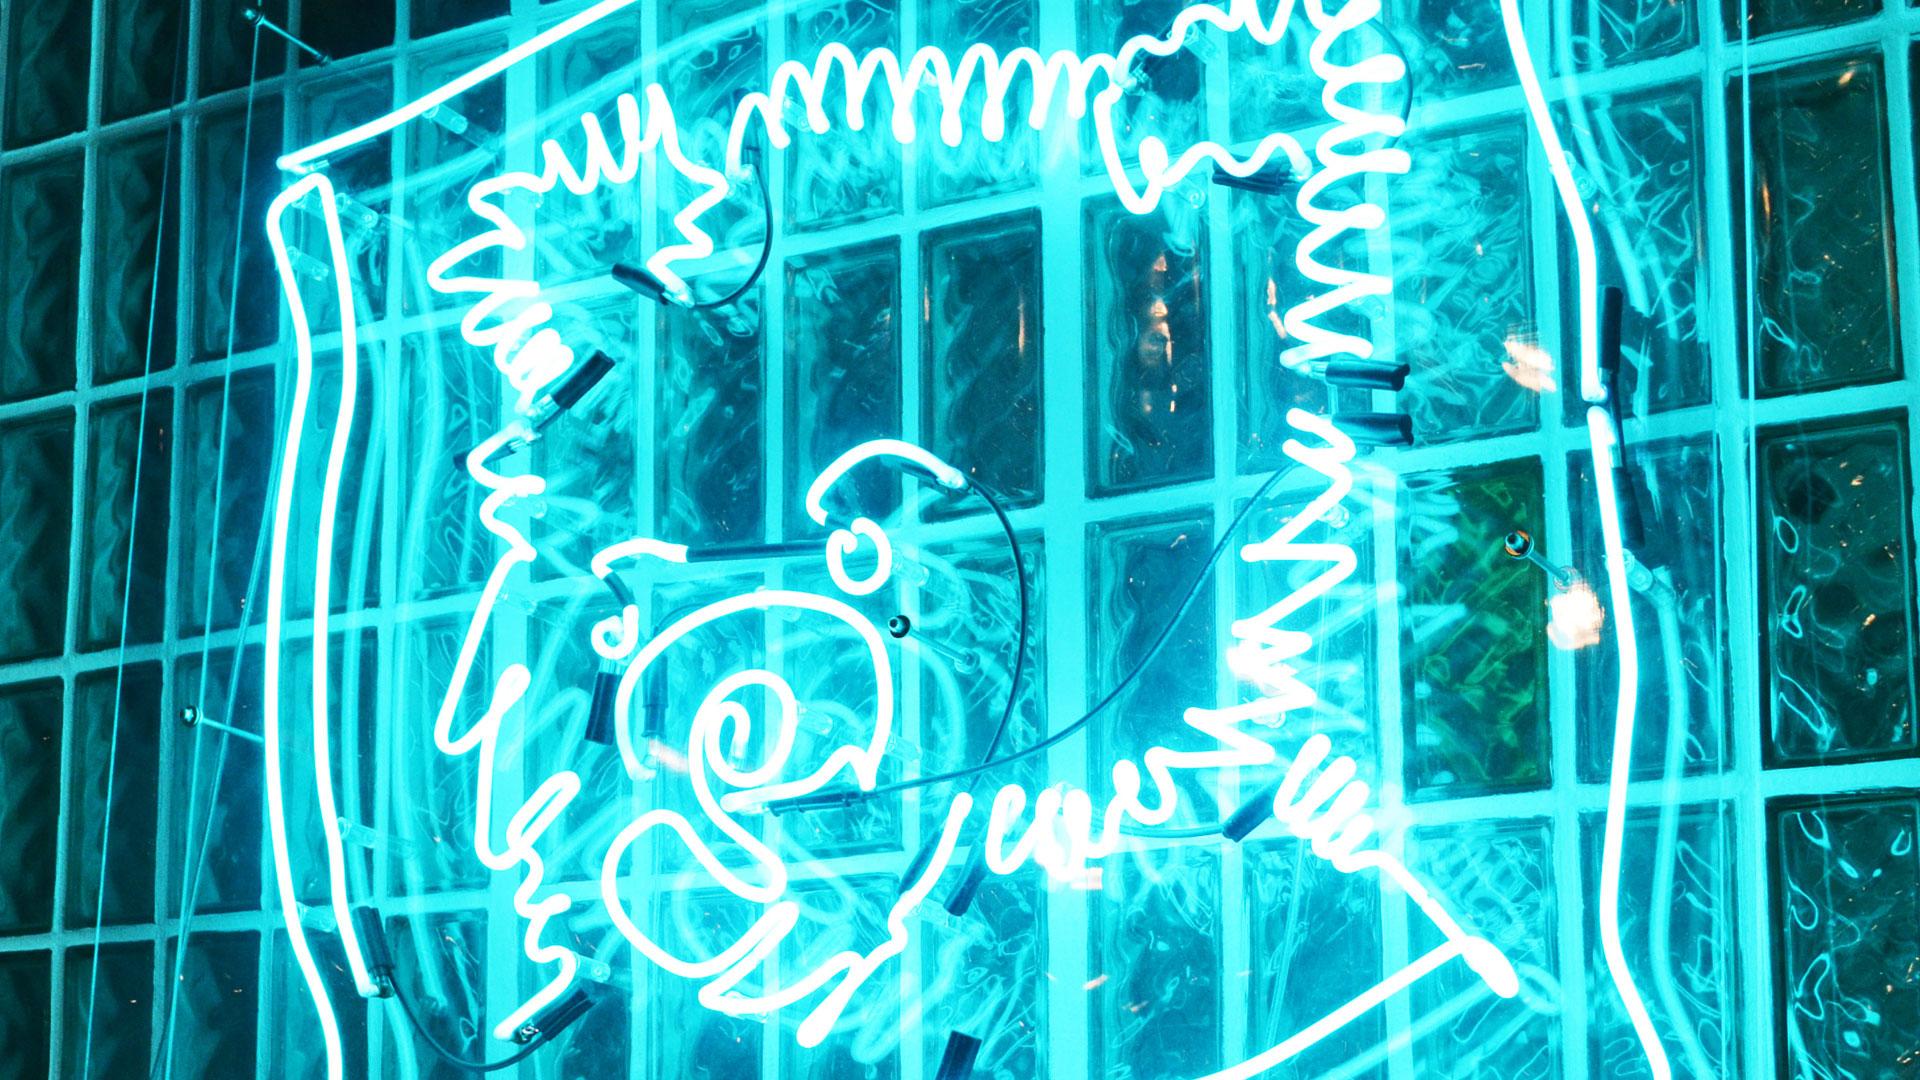 171109_1920x1080_72dpi_neon